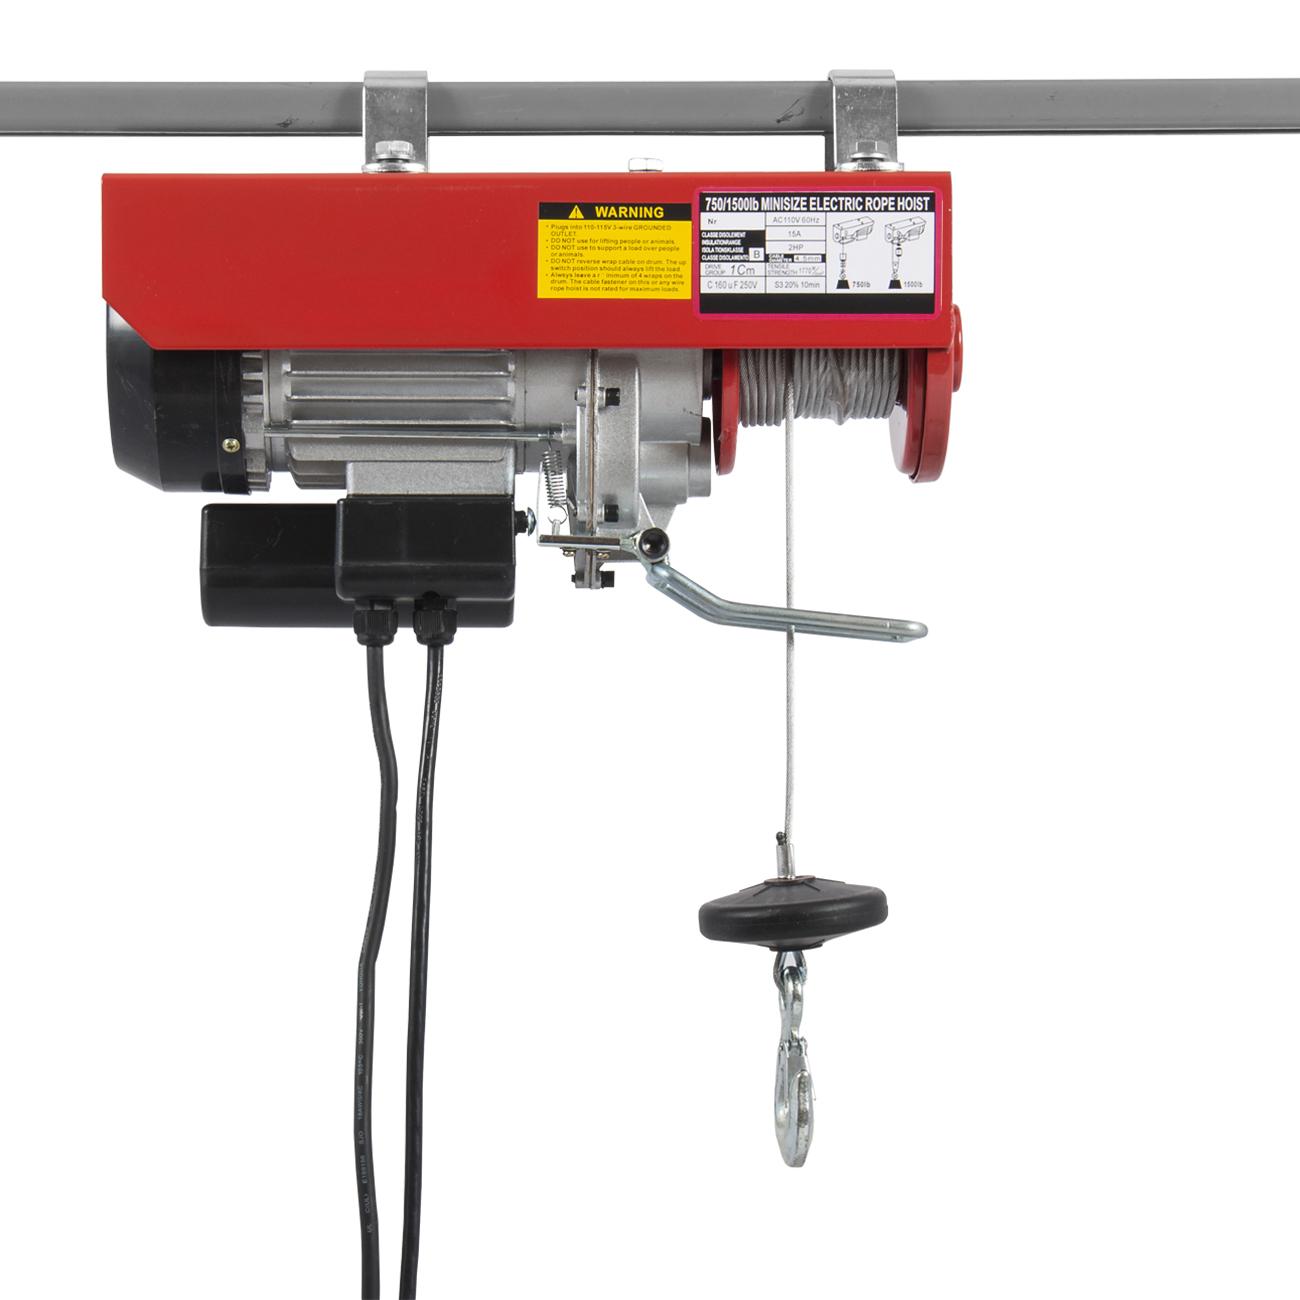 Pro Electric Motor Overhead Winch Hoist Crane Lift W